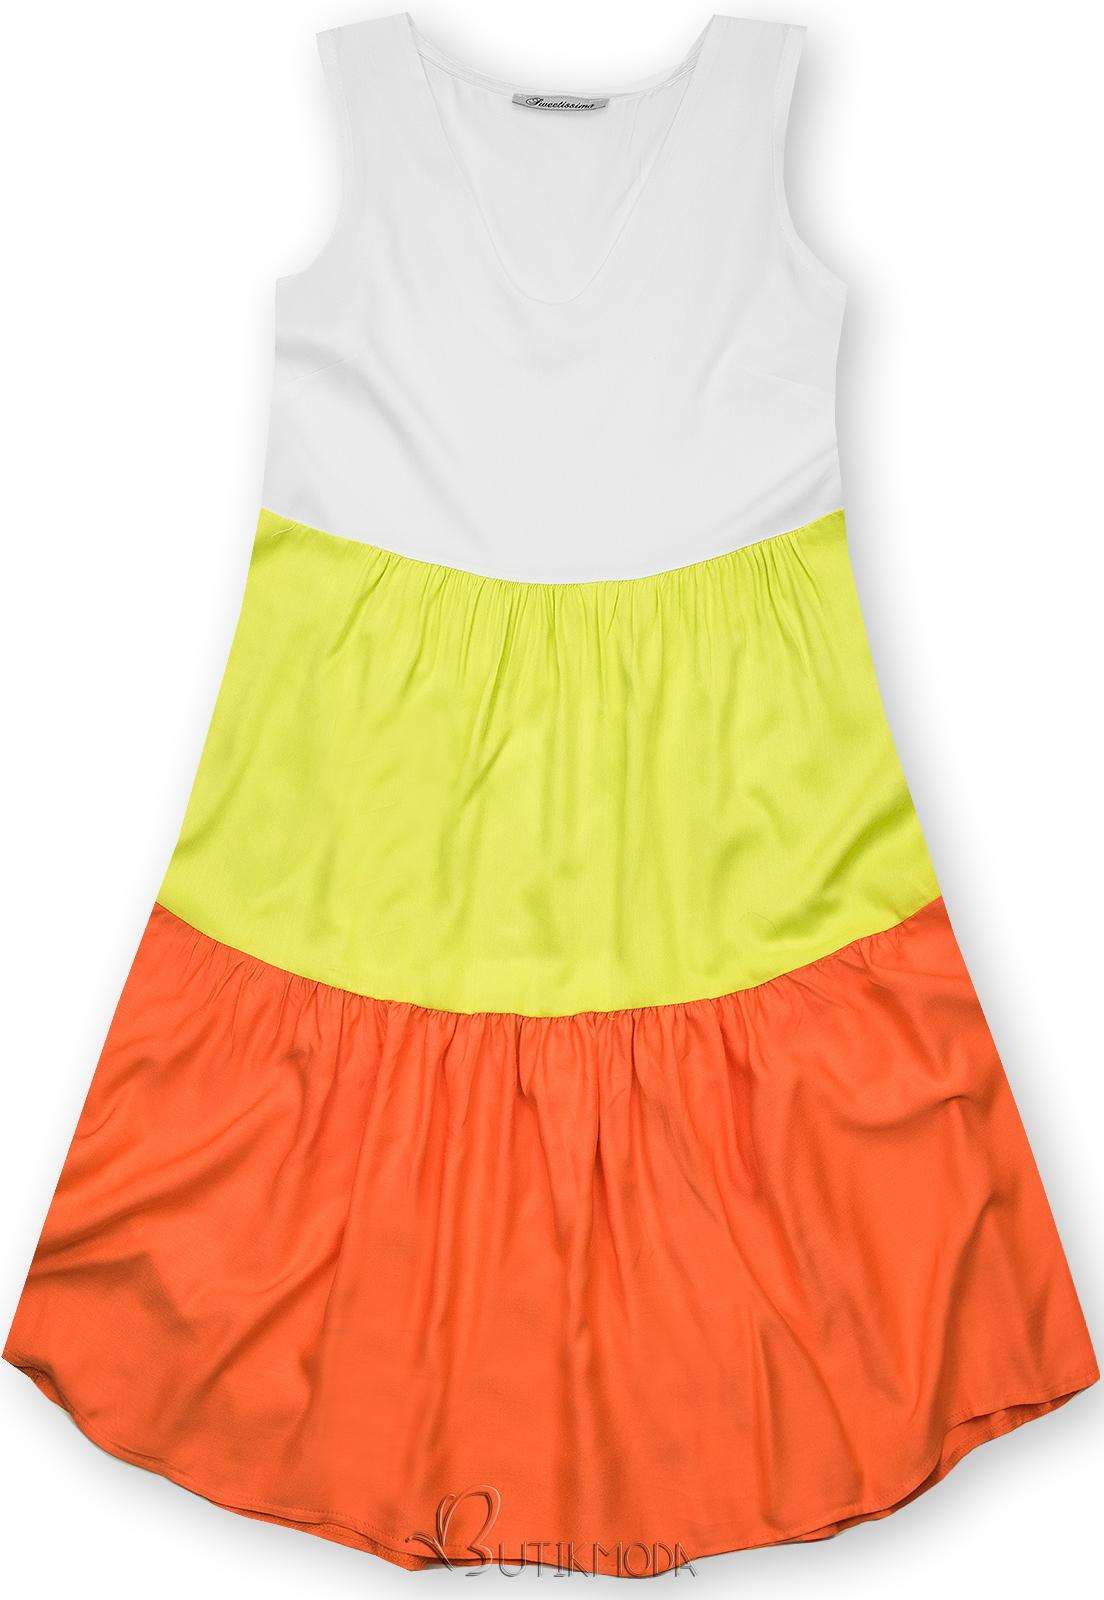 Kleid mit Color-Blocking-Optik gelbgrün/orange